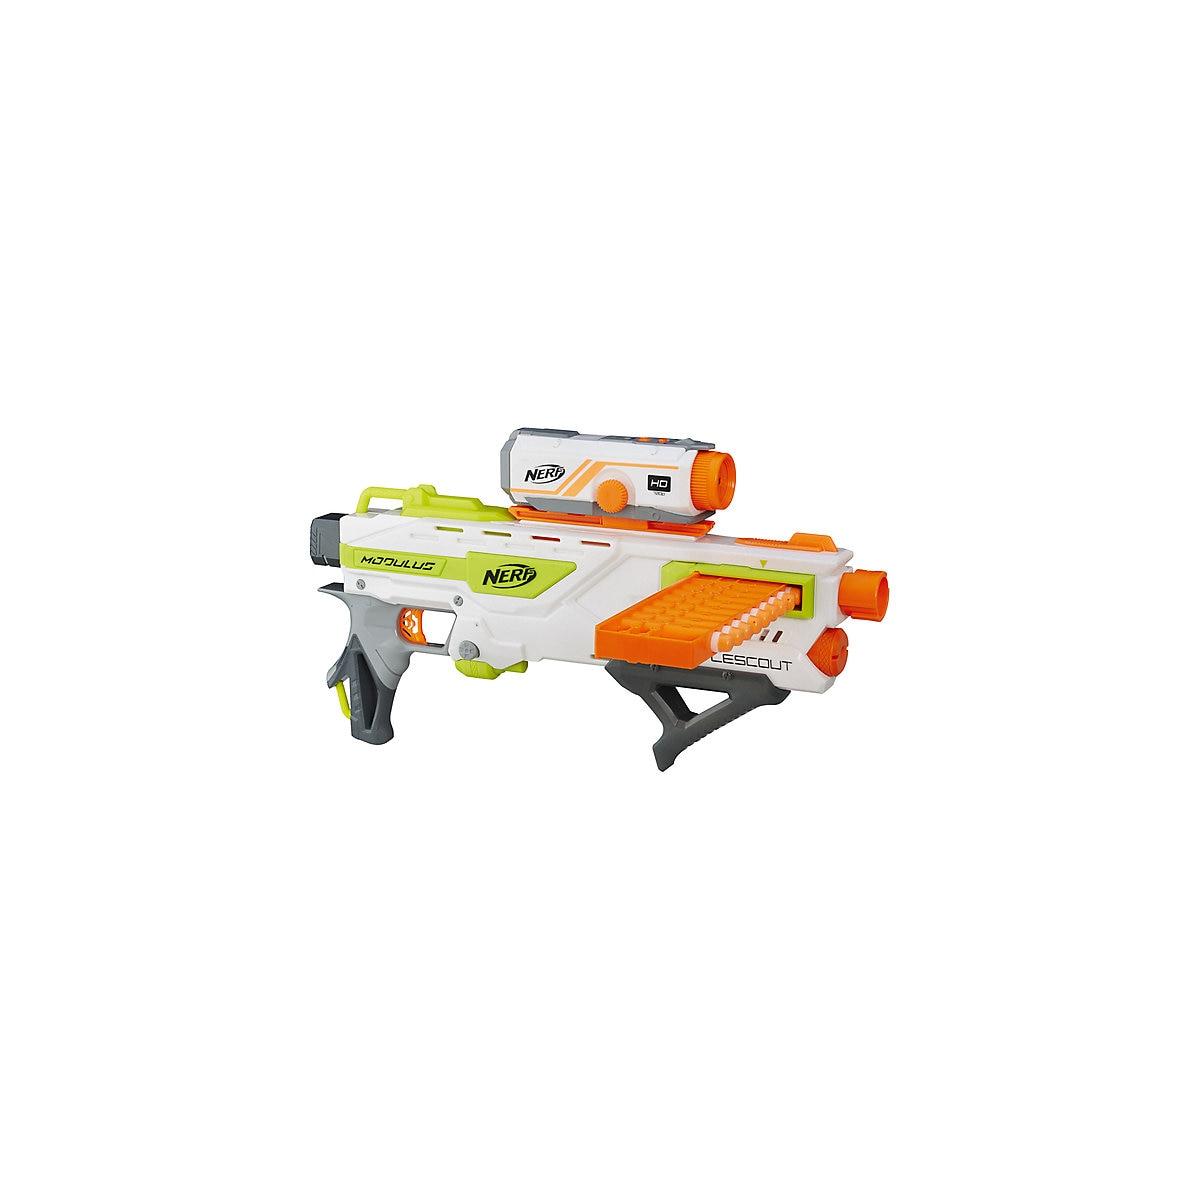 NERF Toy Guns 8959704 gun weapon toys games pneumatic blaster boy orbiz revolver Outdoor Fun Sports MTpromo